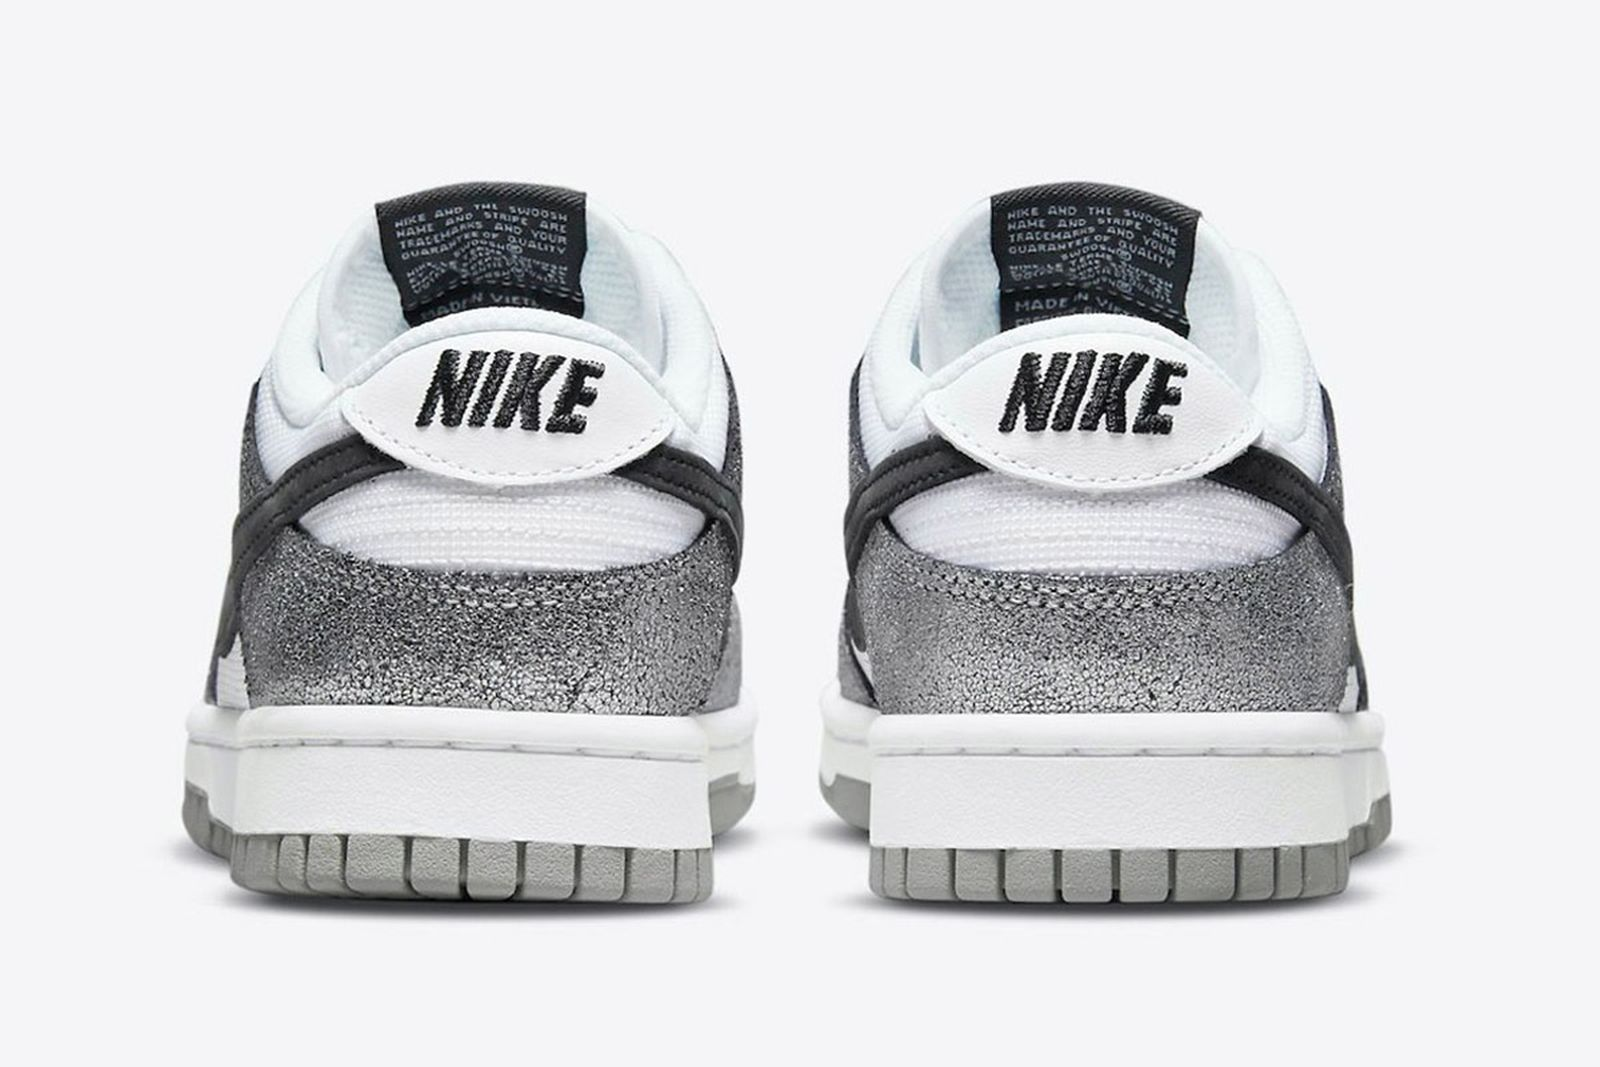 nike-metallic-silver-dunk-low-03